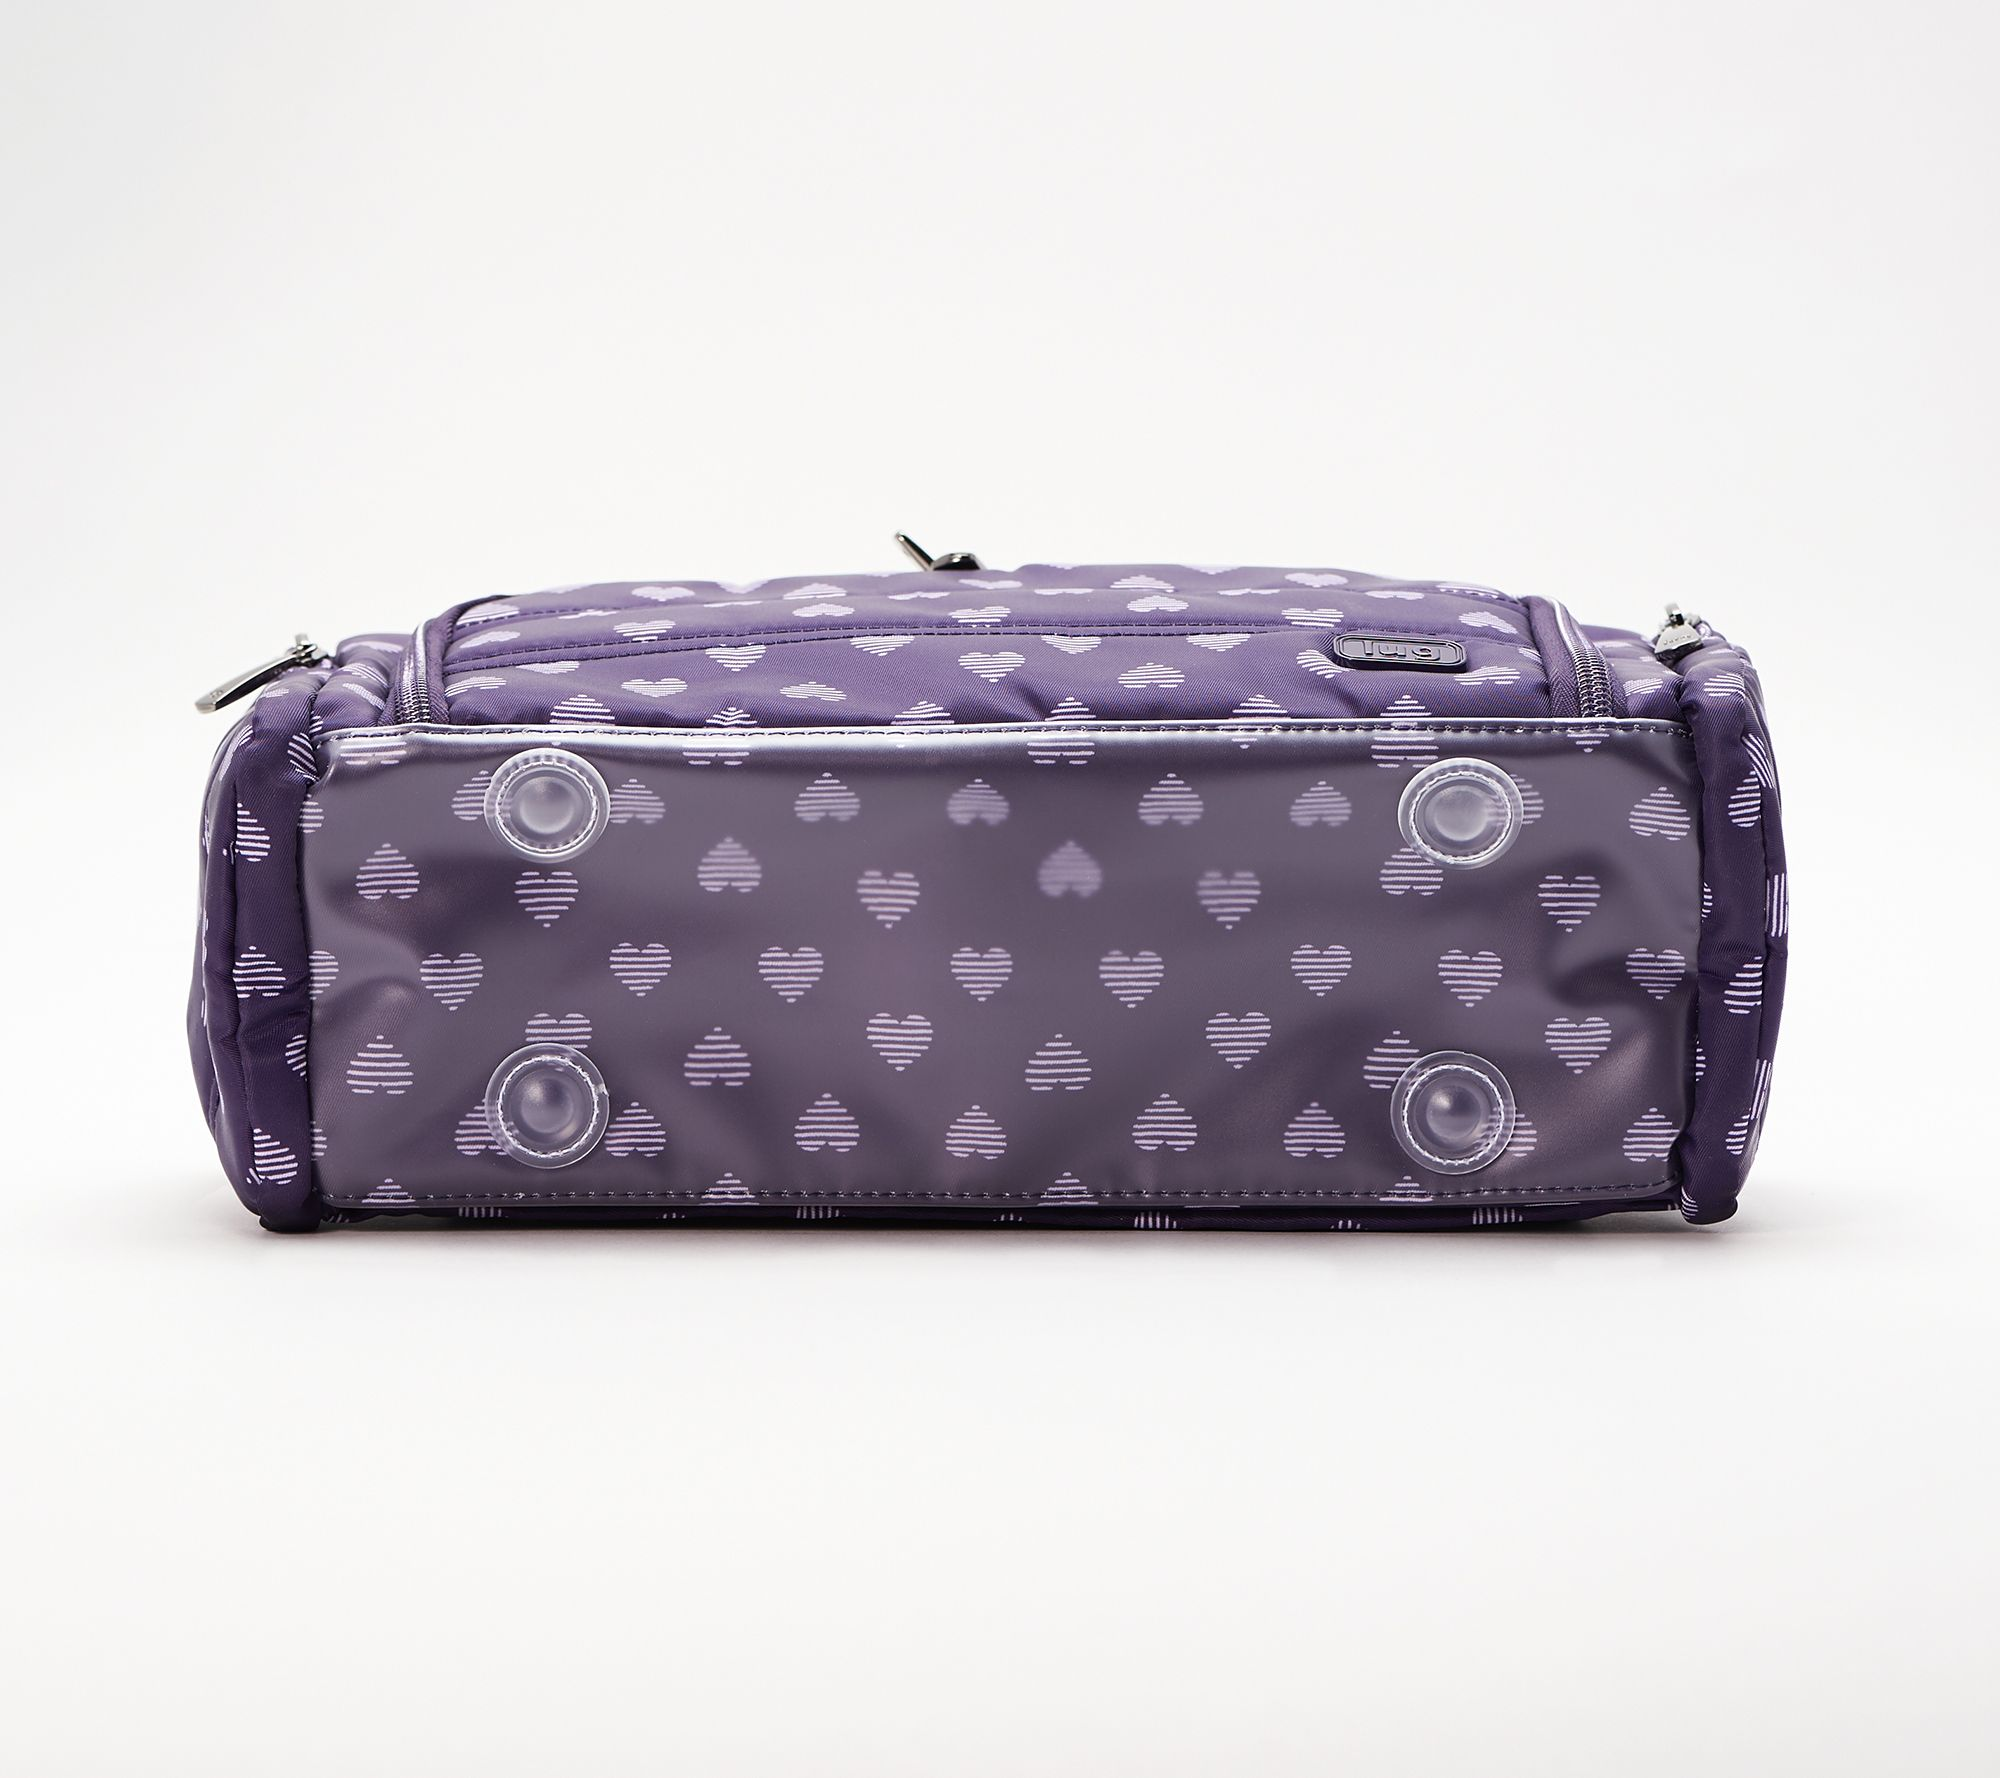 Lug Cosmetic Case -Trolley - Page 1 — QVC.com e1277d3173ed6